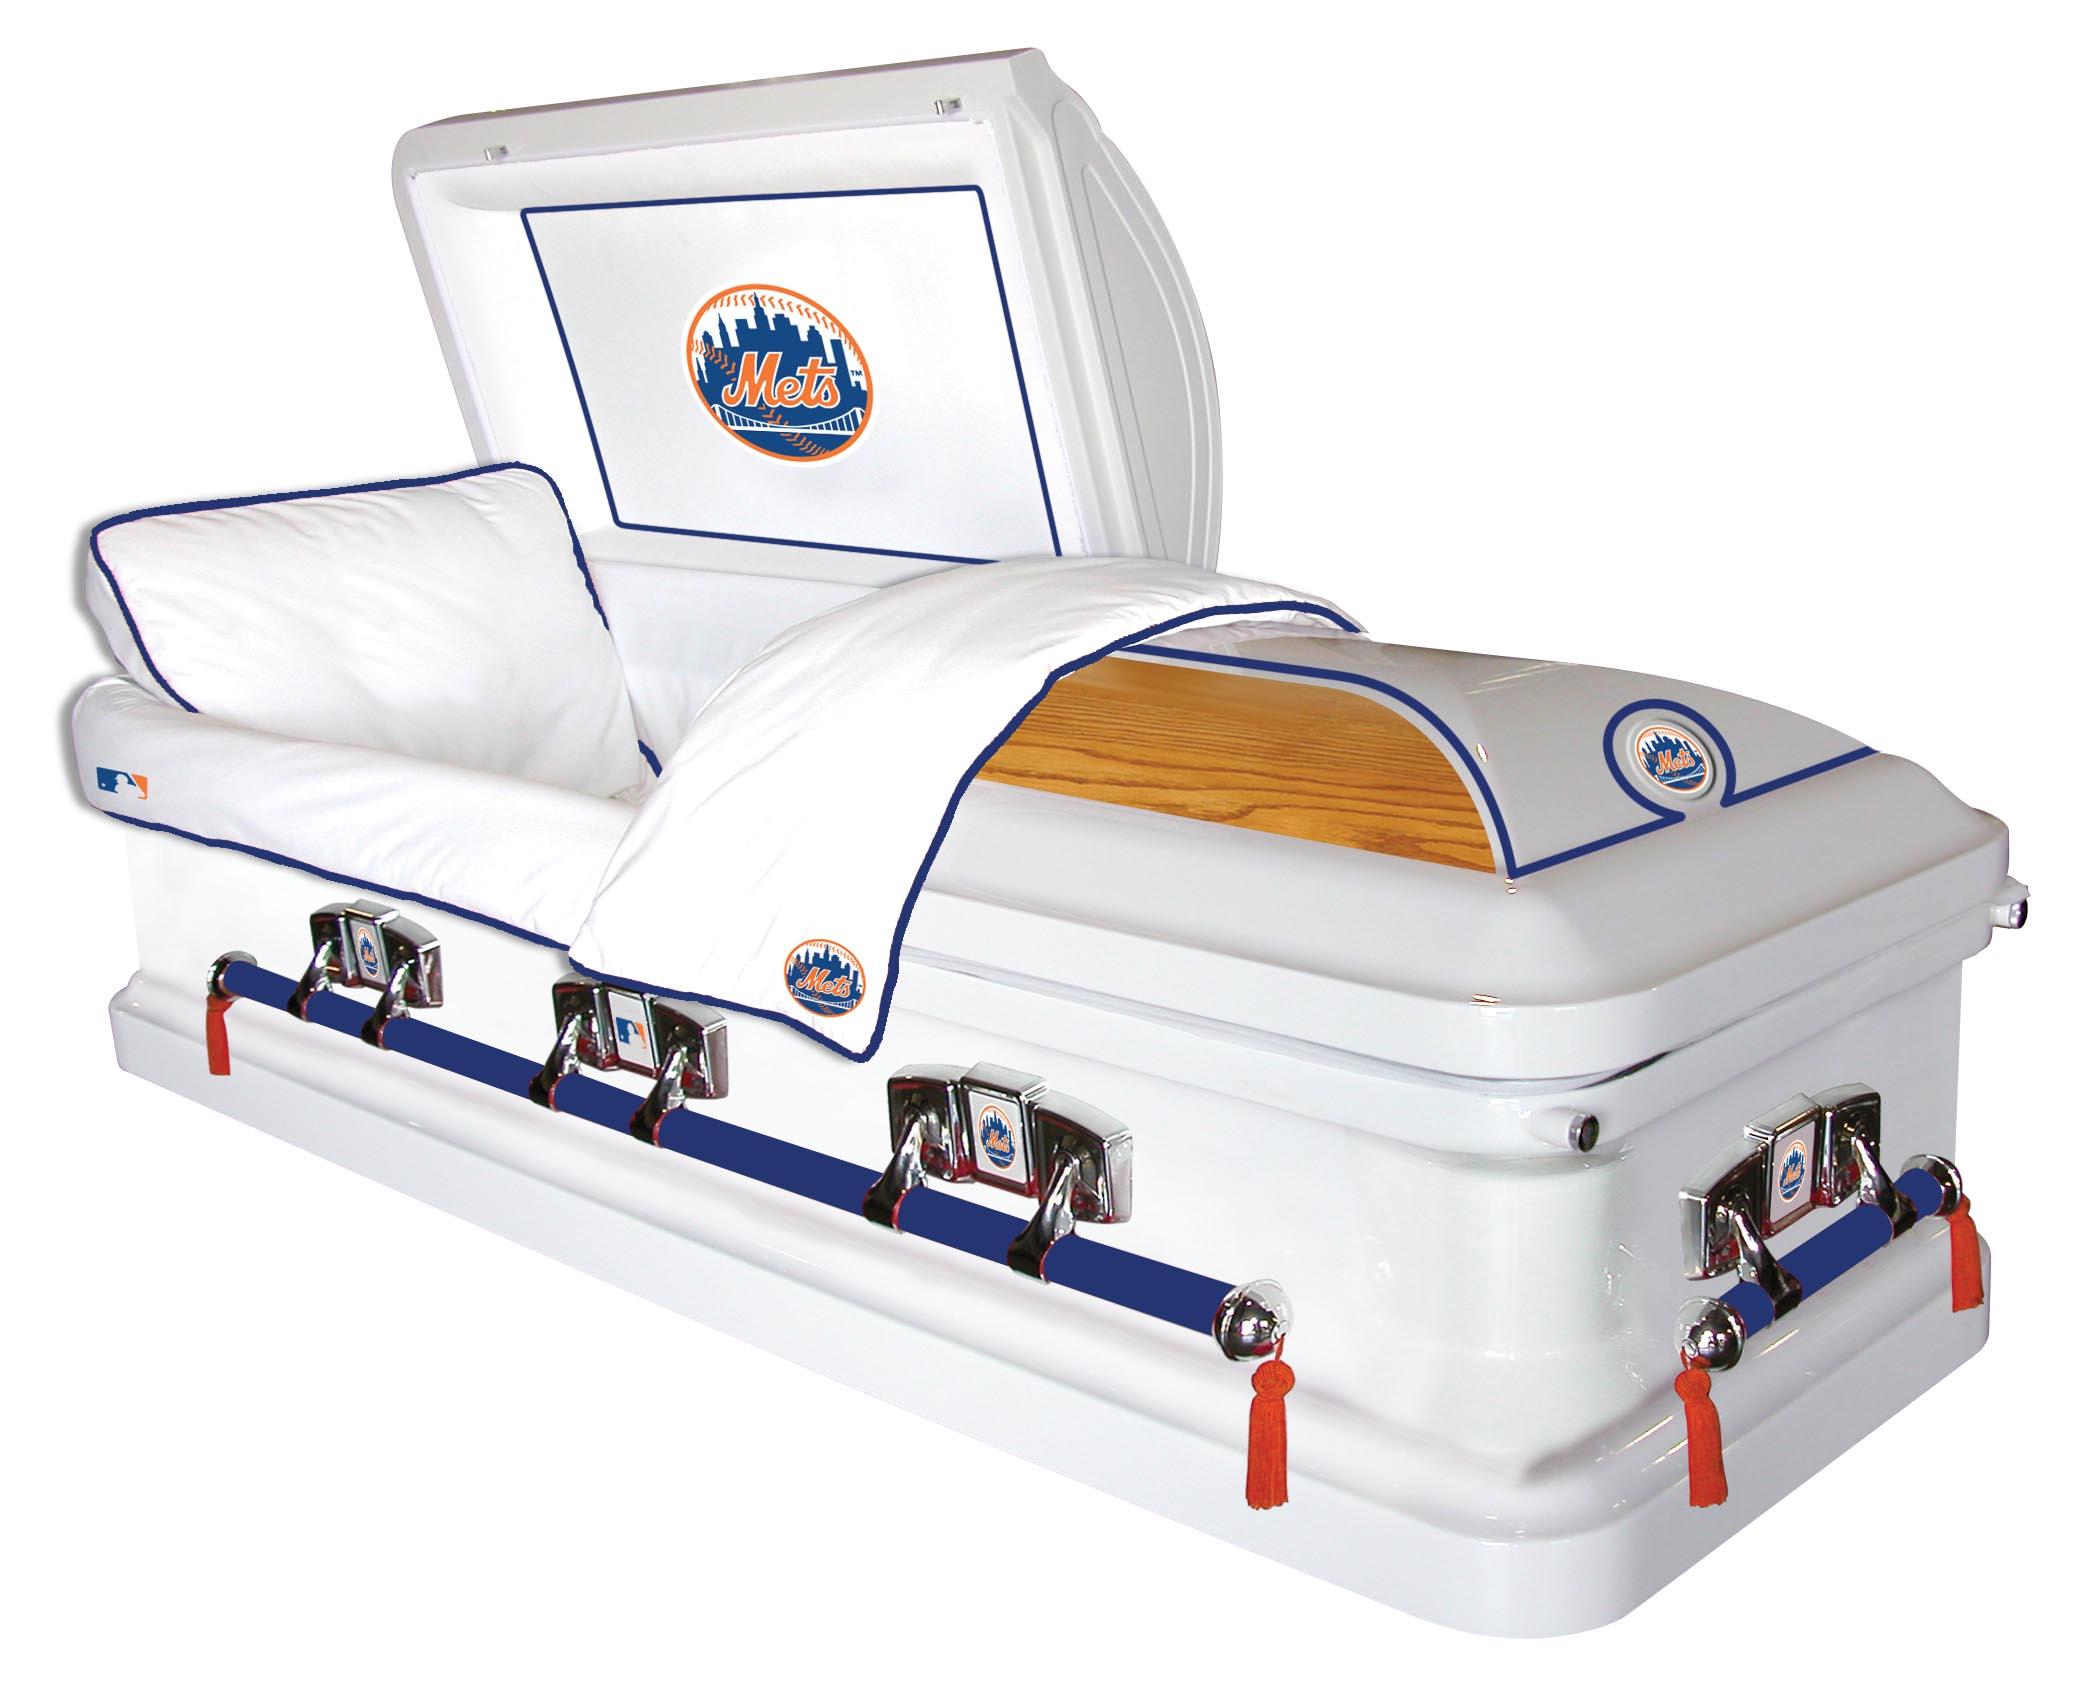 MLB_casket_Mets_